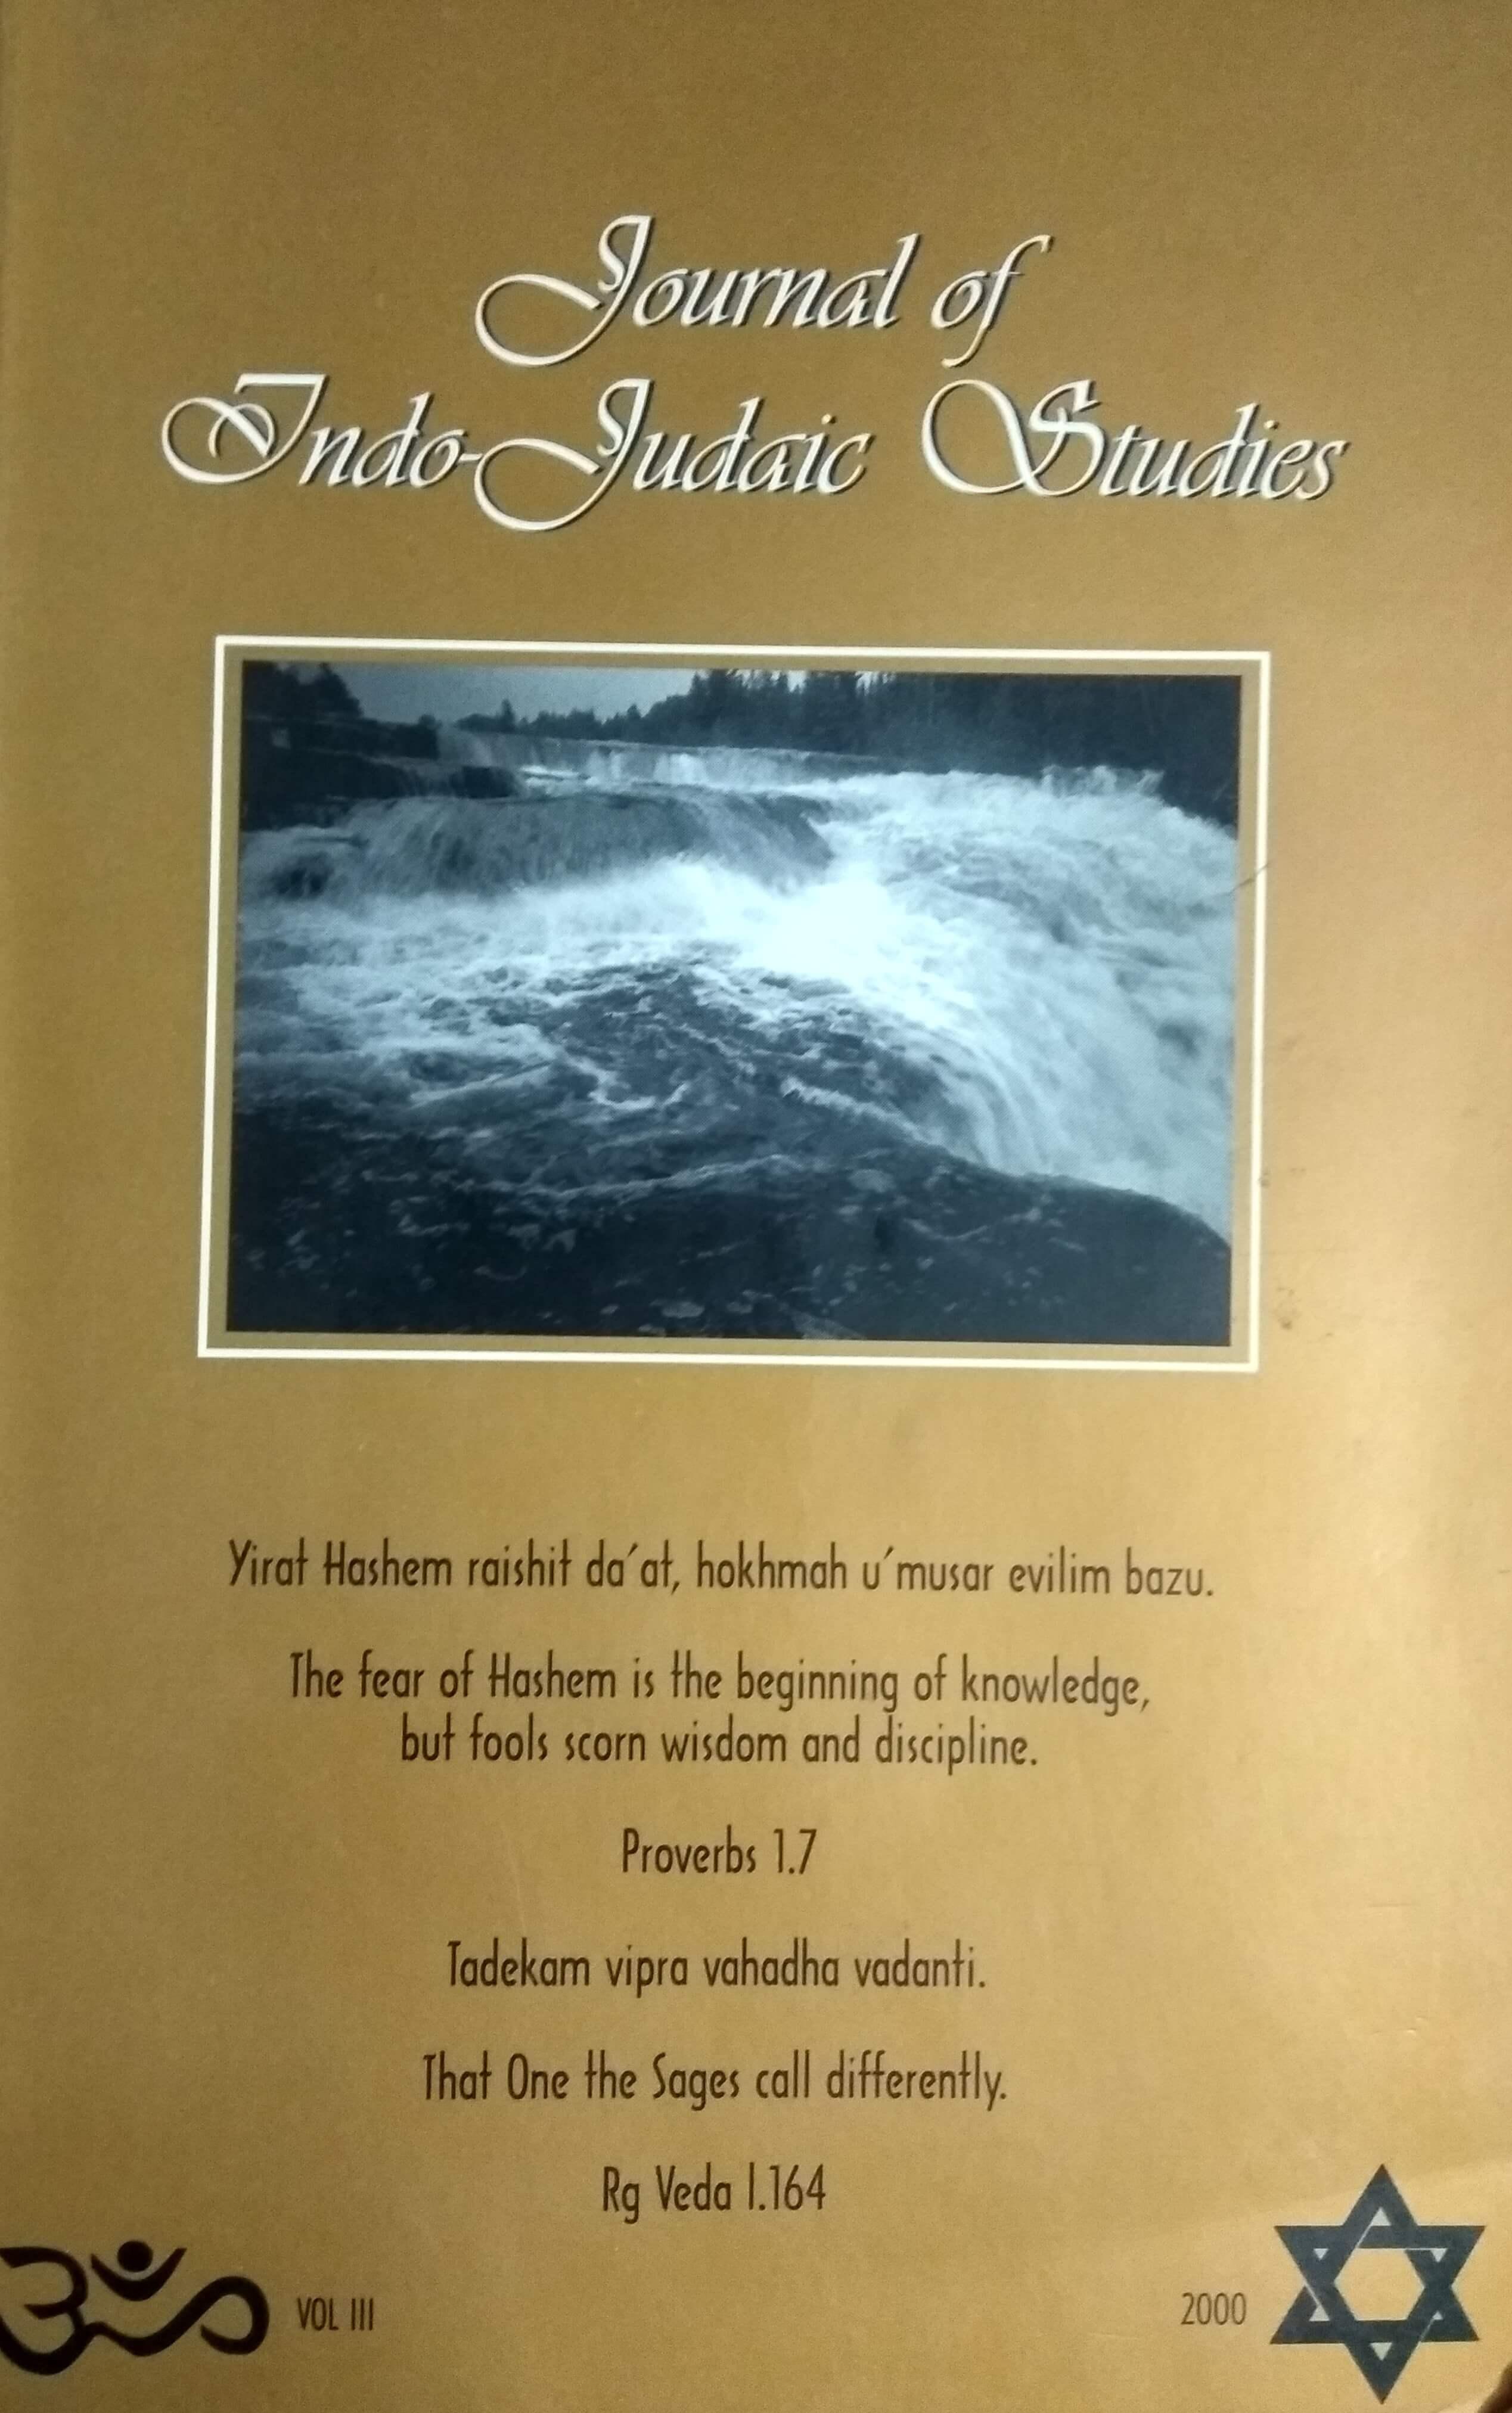 Journal of Indo-Judaic Studies volume 1